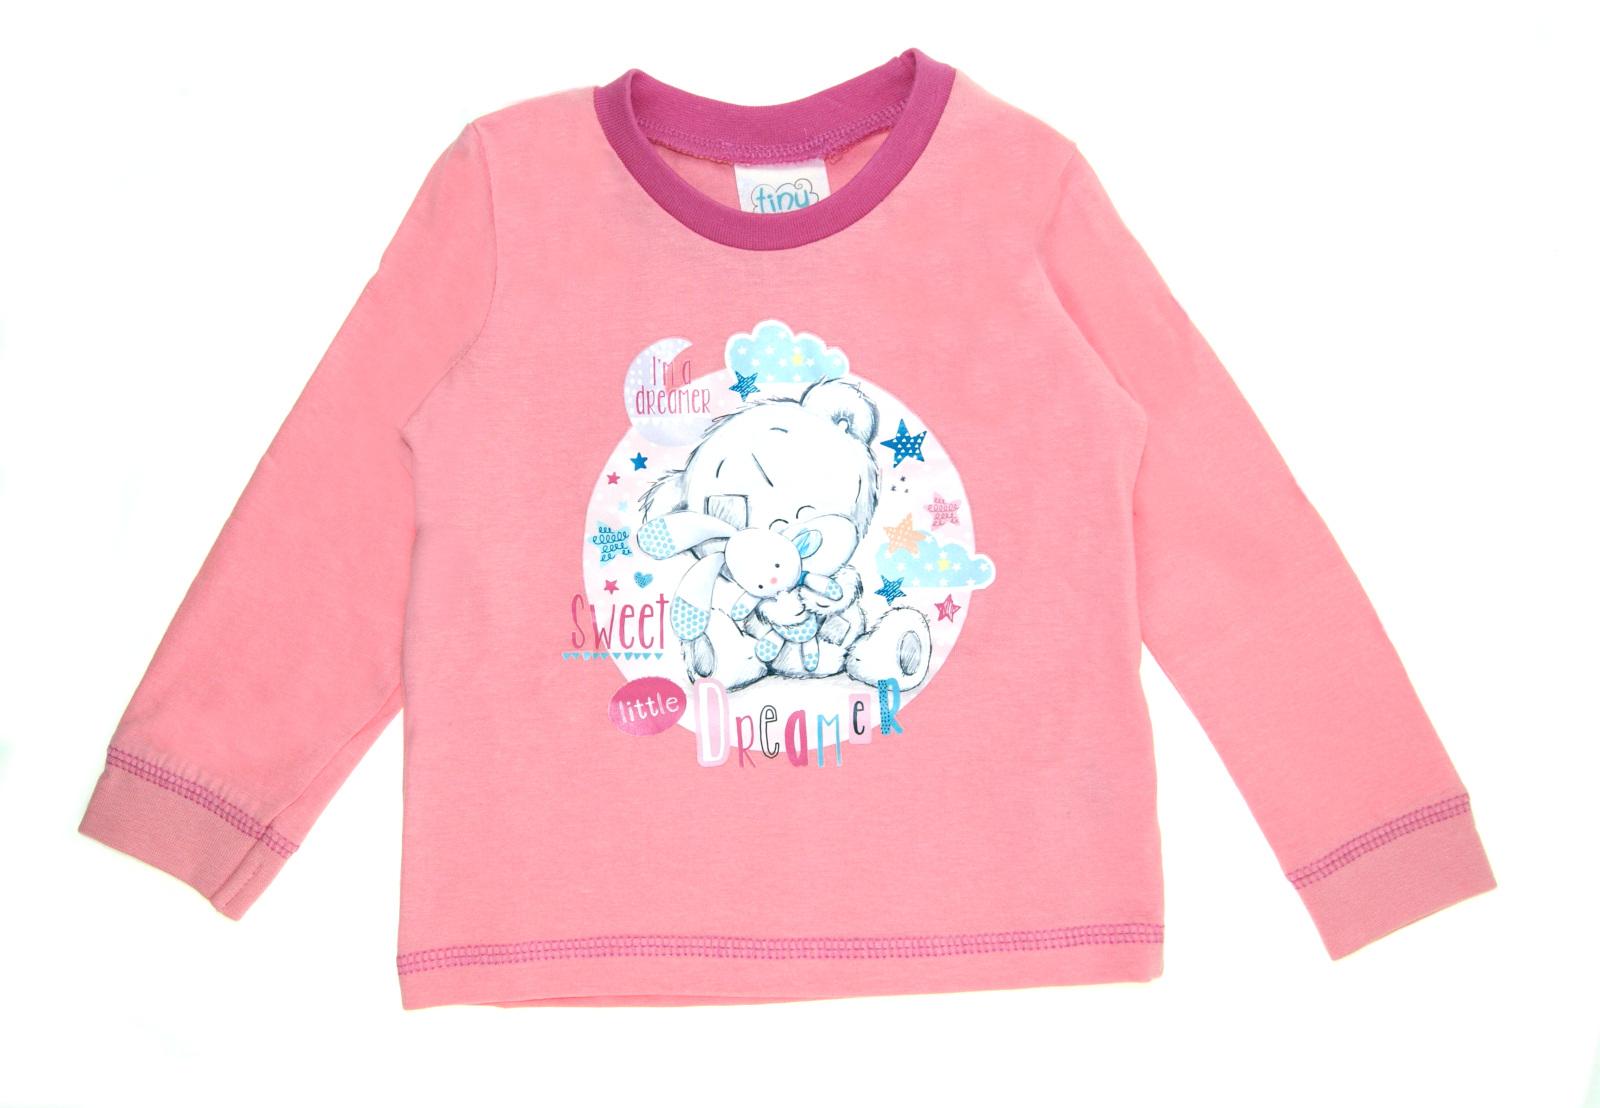 f83f9f9ad Baby Boys Girls Pyjamas Kids Toddlers Me To You Pjs Cute Tatty Teddy ...